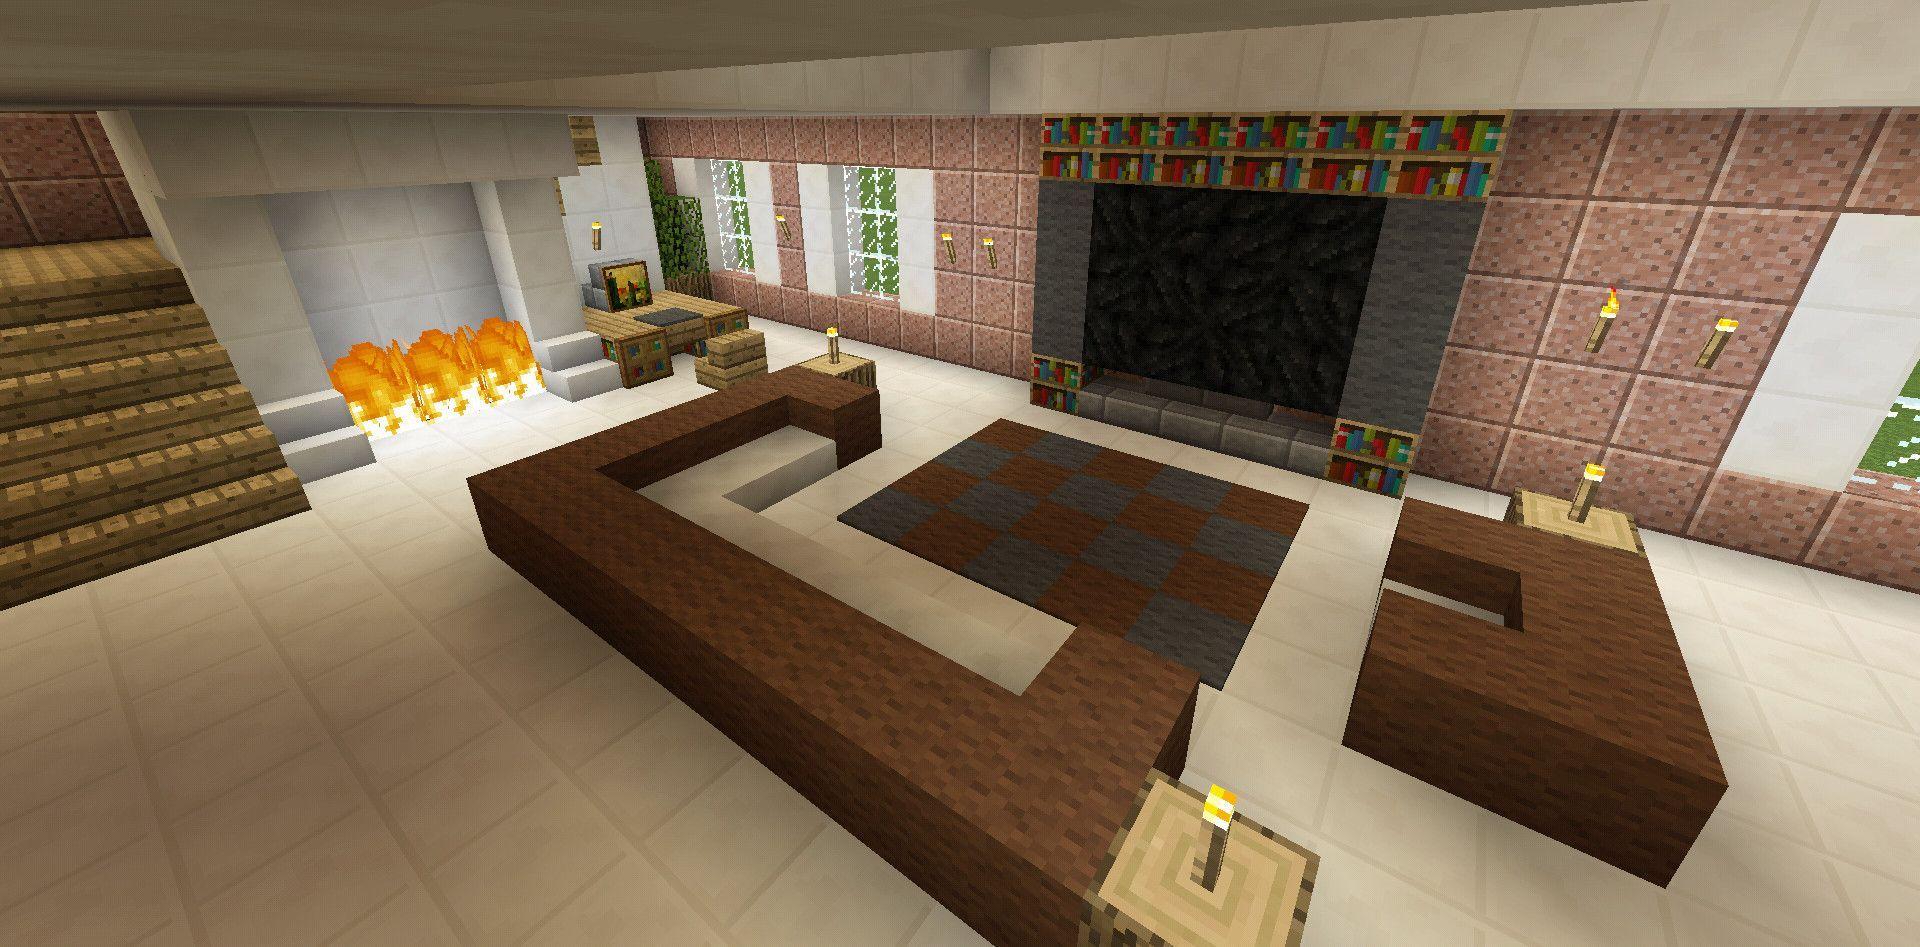 Minecraft Room Decoration Ideas Luxury Minecraft Living Room Family Room Furnitu Decoration Fa In 2020 Minecraft Room Decor Minecraft Room Living Room In Minecraft